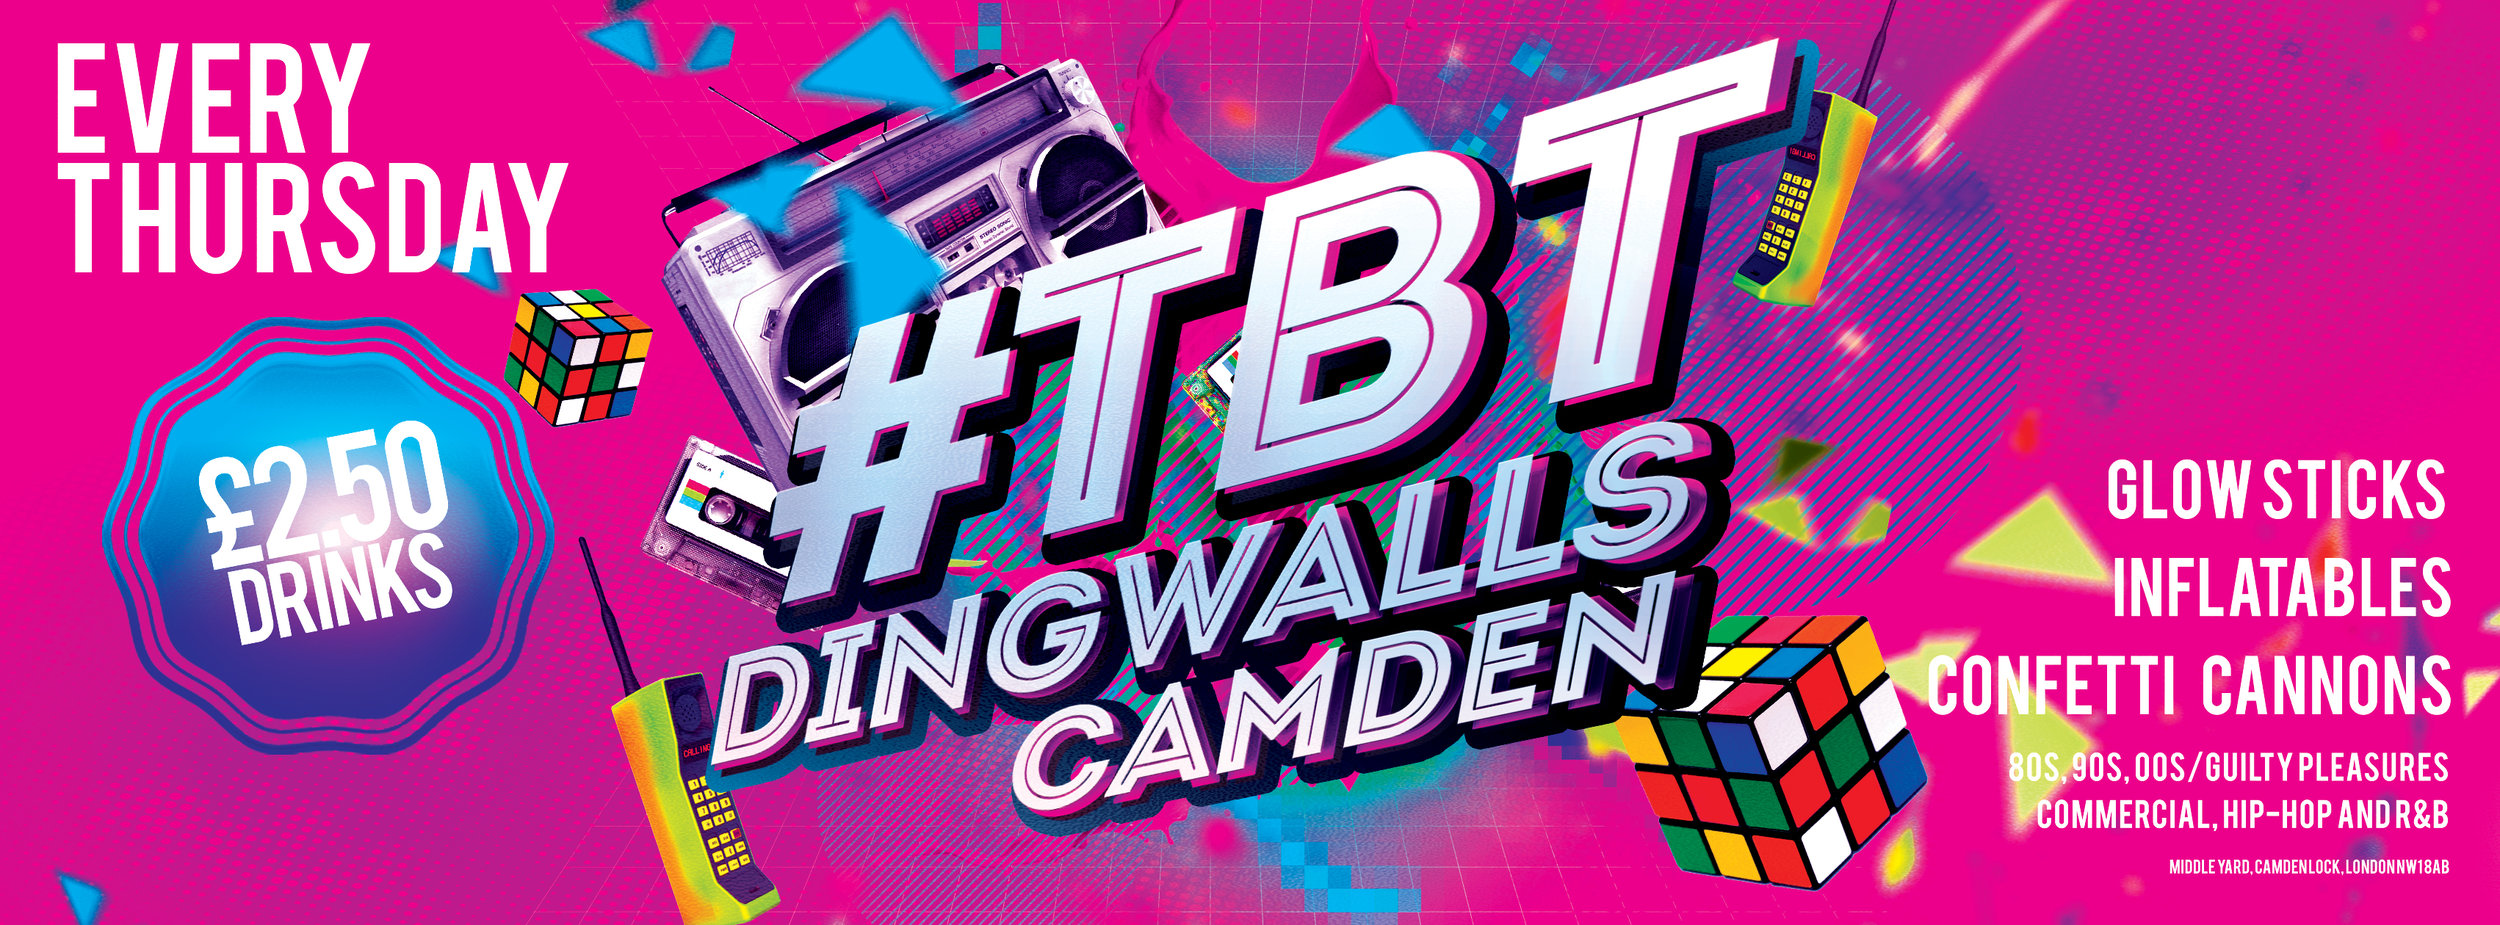 #TBT_Dingwalls_generic_fbcover_pink.jpg